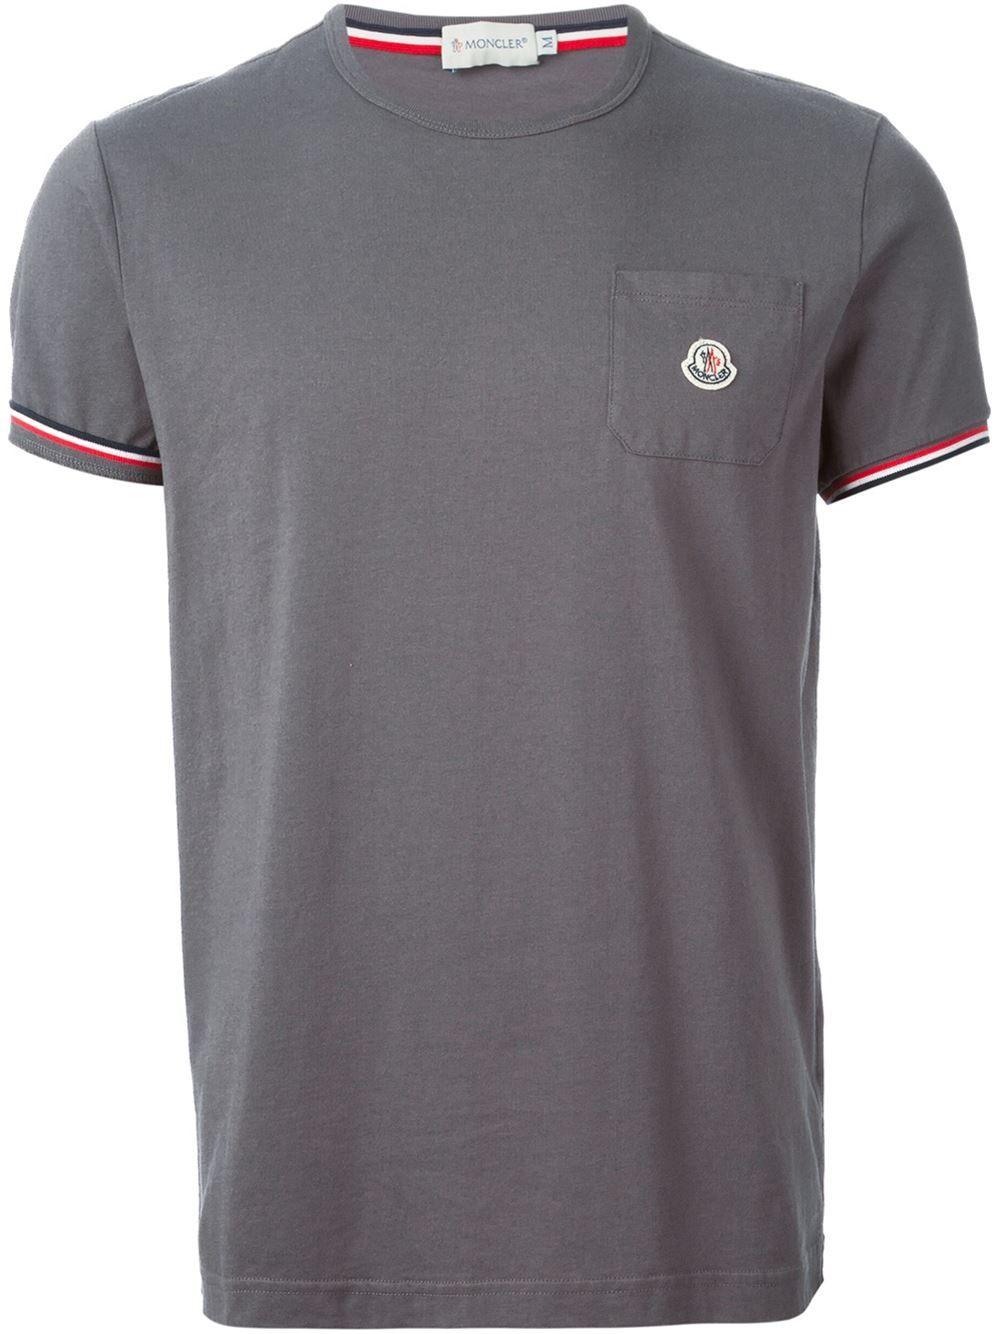 mens grey moncler t shirt